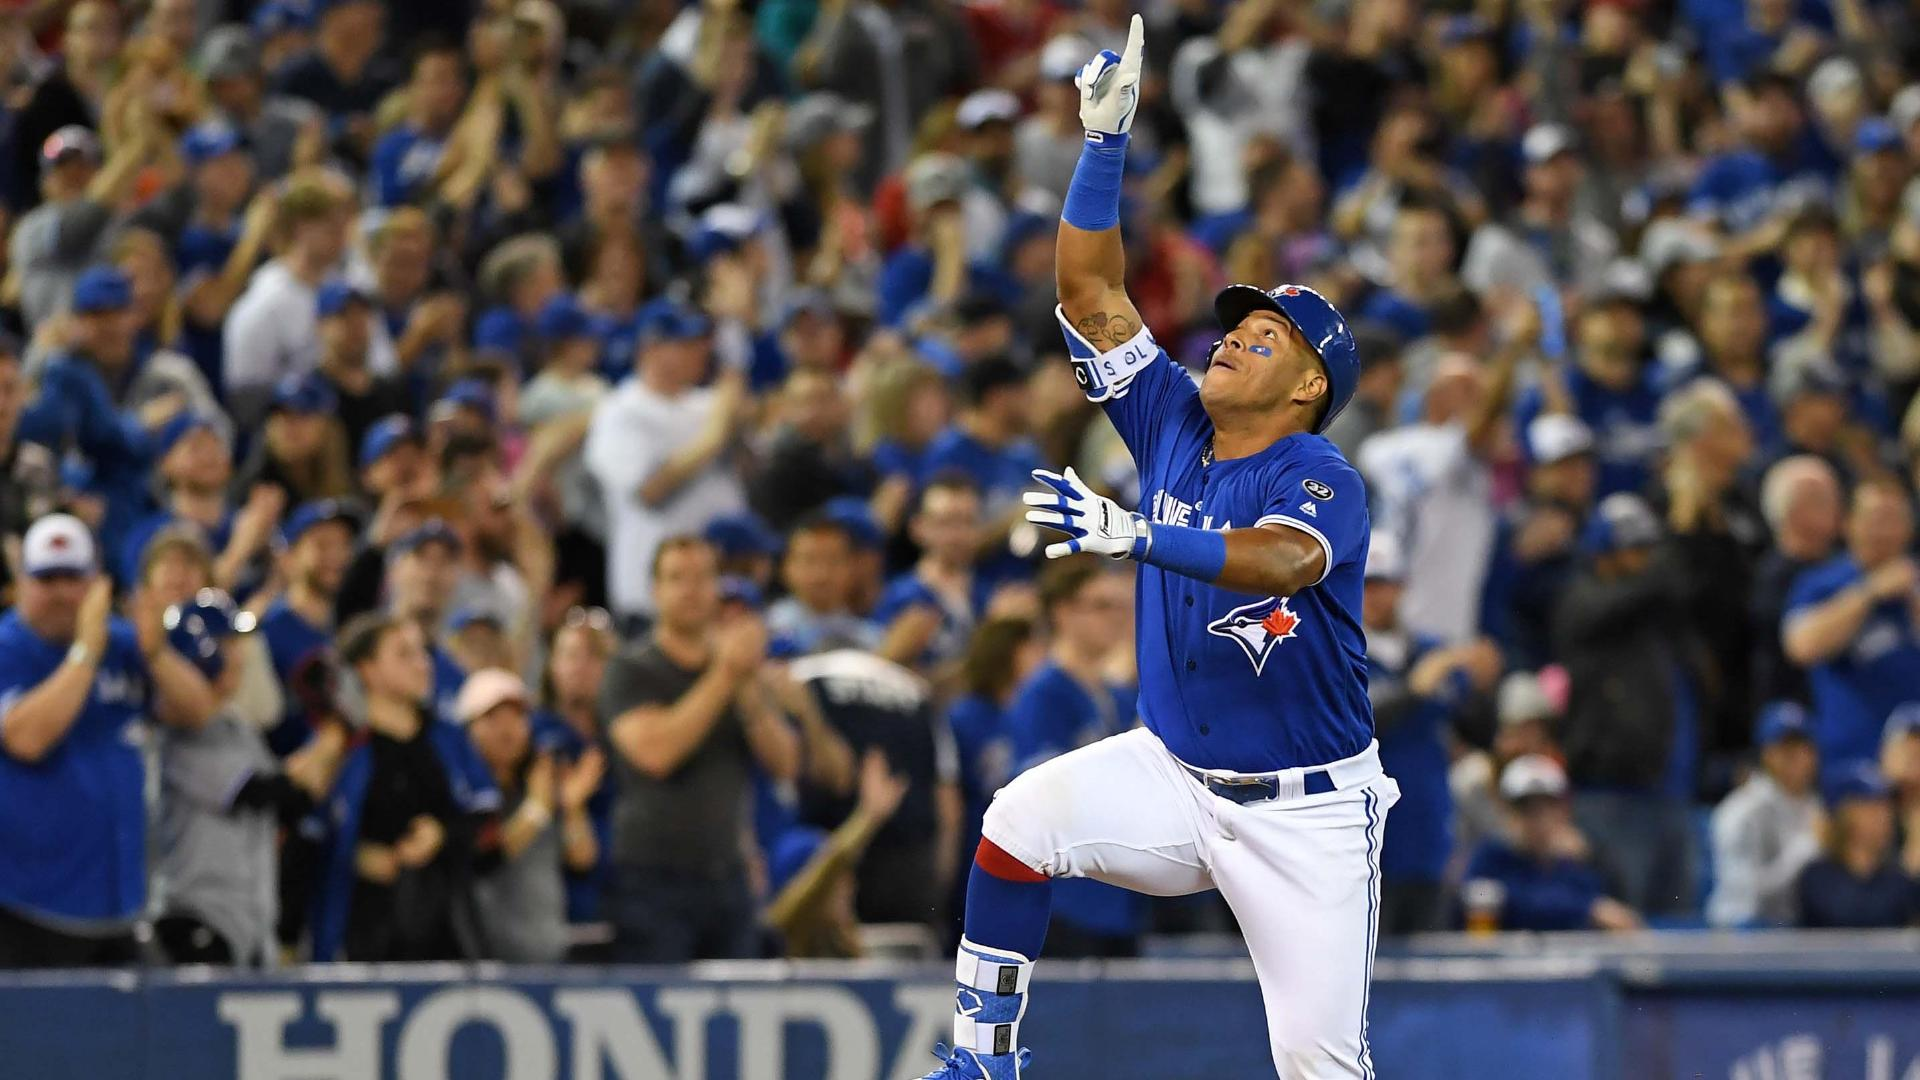 http://a.espncdn.com/media/motion/2018/0401/dm_180331_MLB_Yankees_Blue_Jays2/dm_180331_MLB_Yankees_Blue_Jays2.jpg